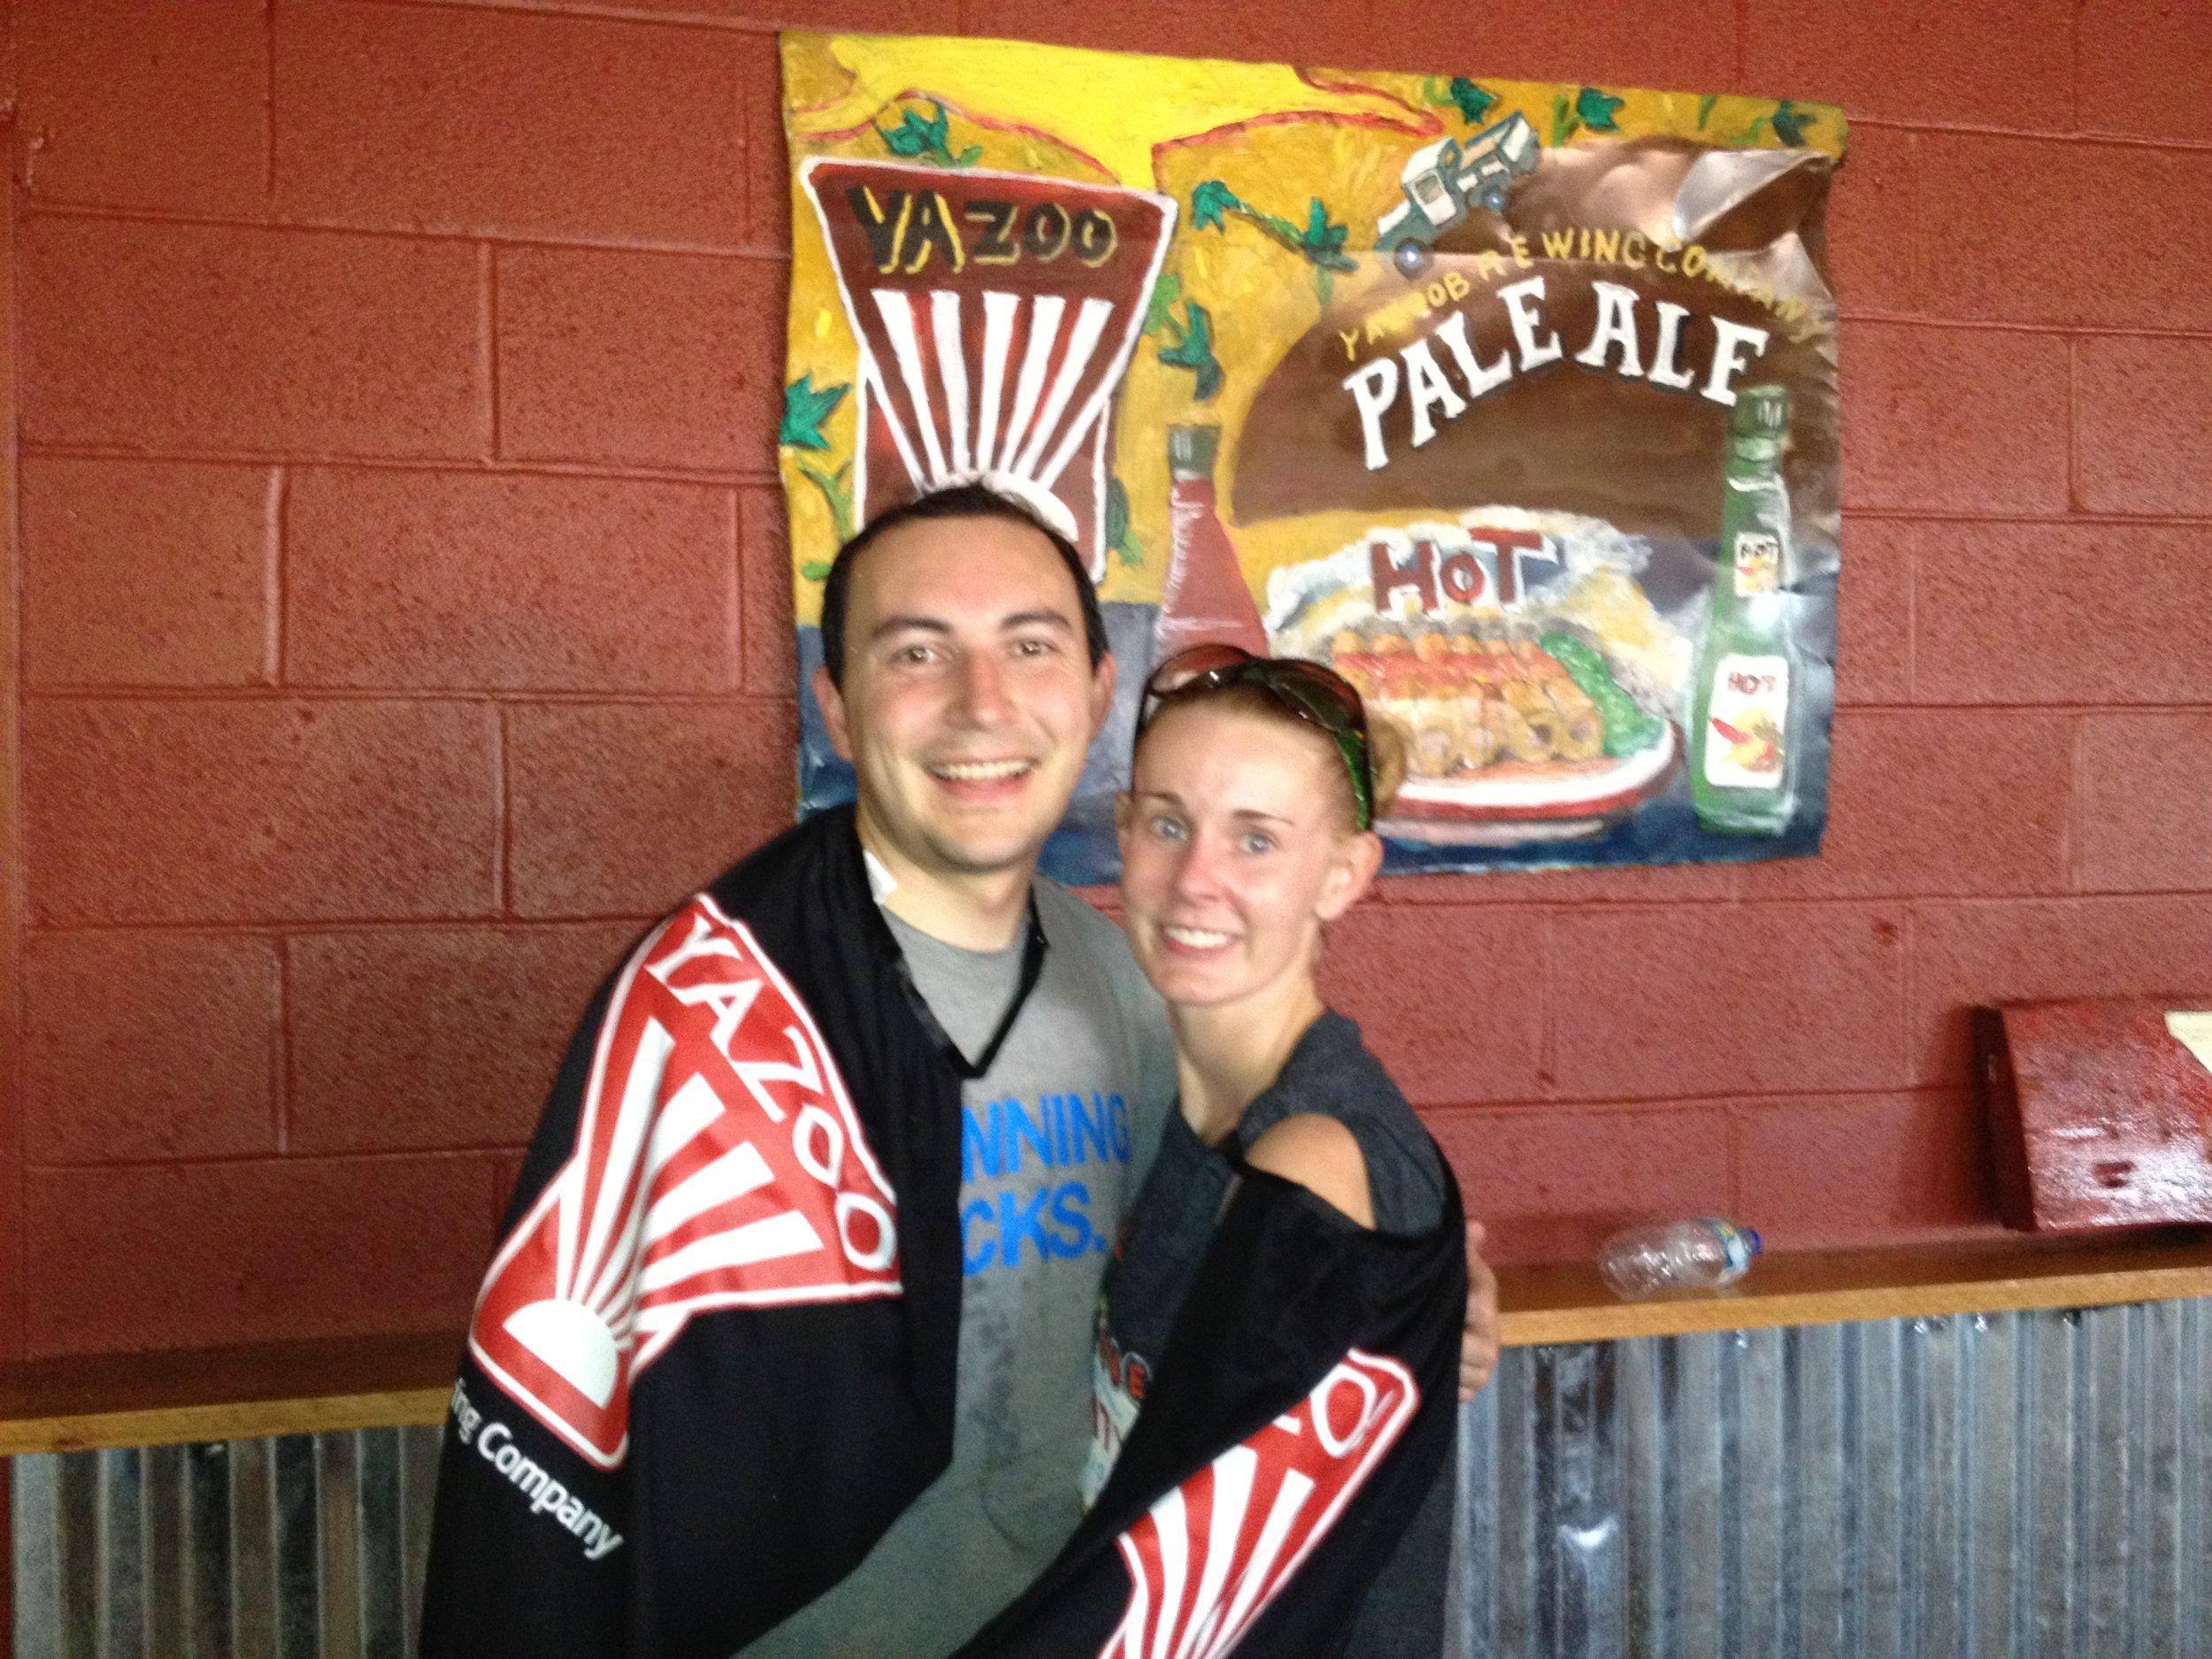 Josh & Vanessa at a Yazoo Barely a 4k 2012